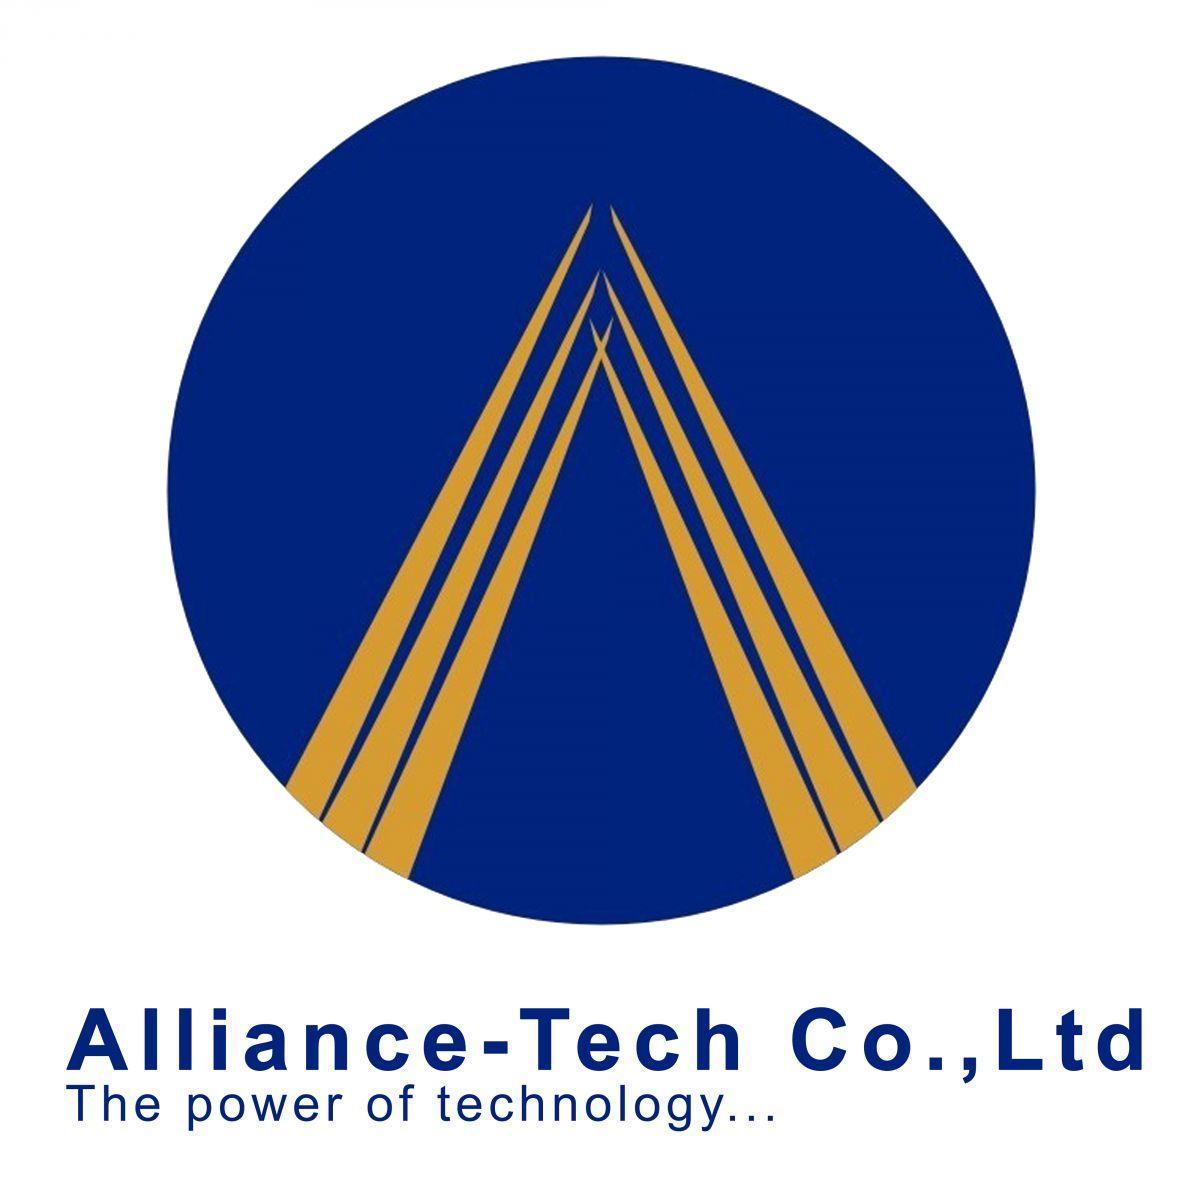 Alliance-Tech Co., Ltd